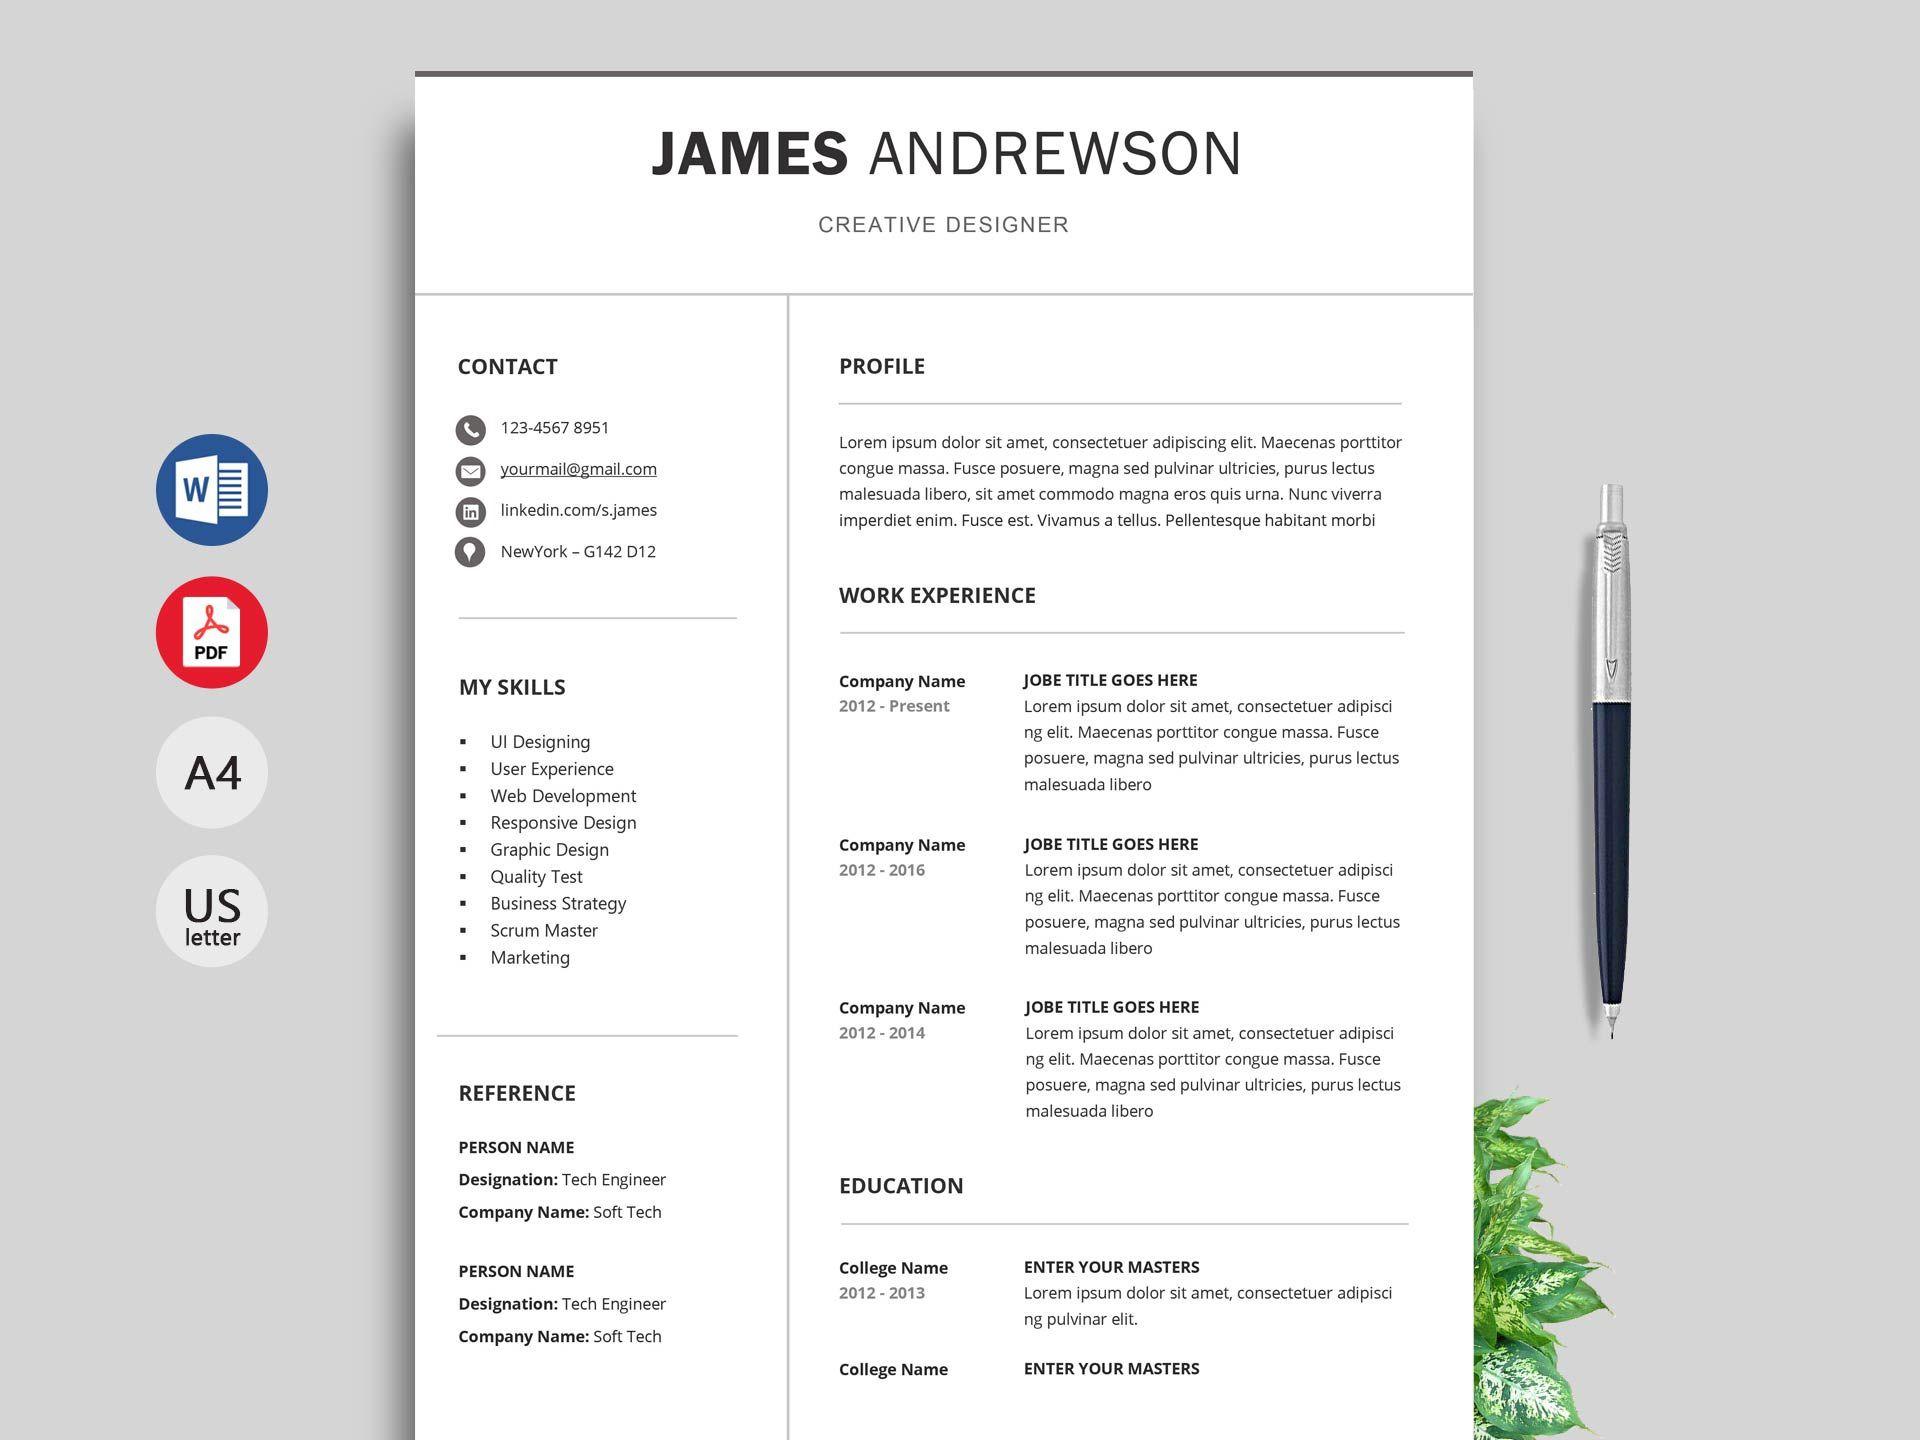 004 Breathtaking Professional Cv Template Free Word Image  Uk Best Resume DownloadFull